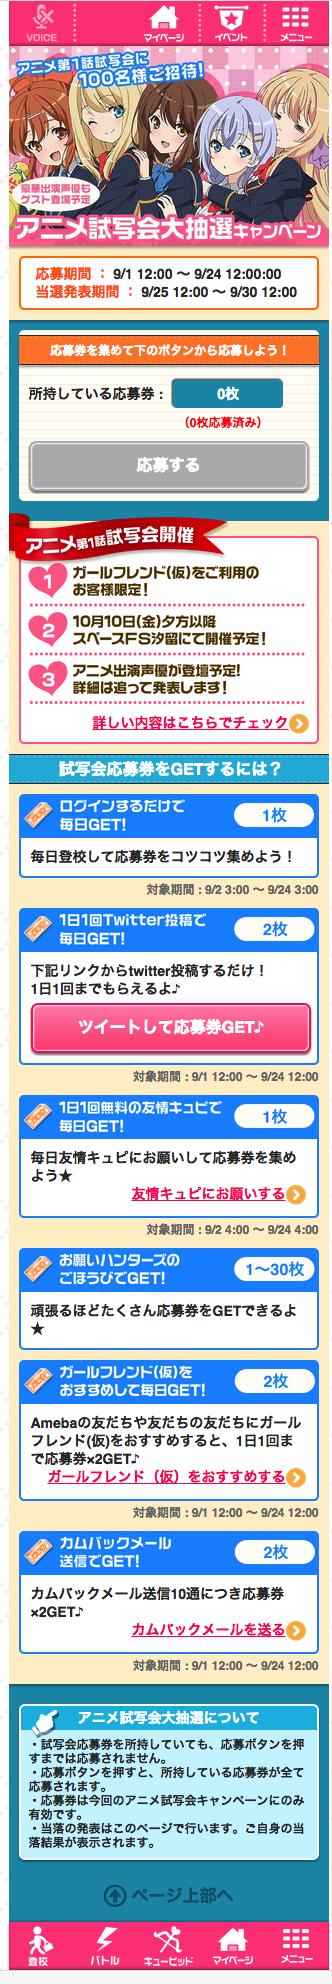 screencapture-vcard-ameba-jp-raffle 2